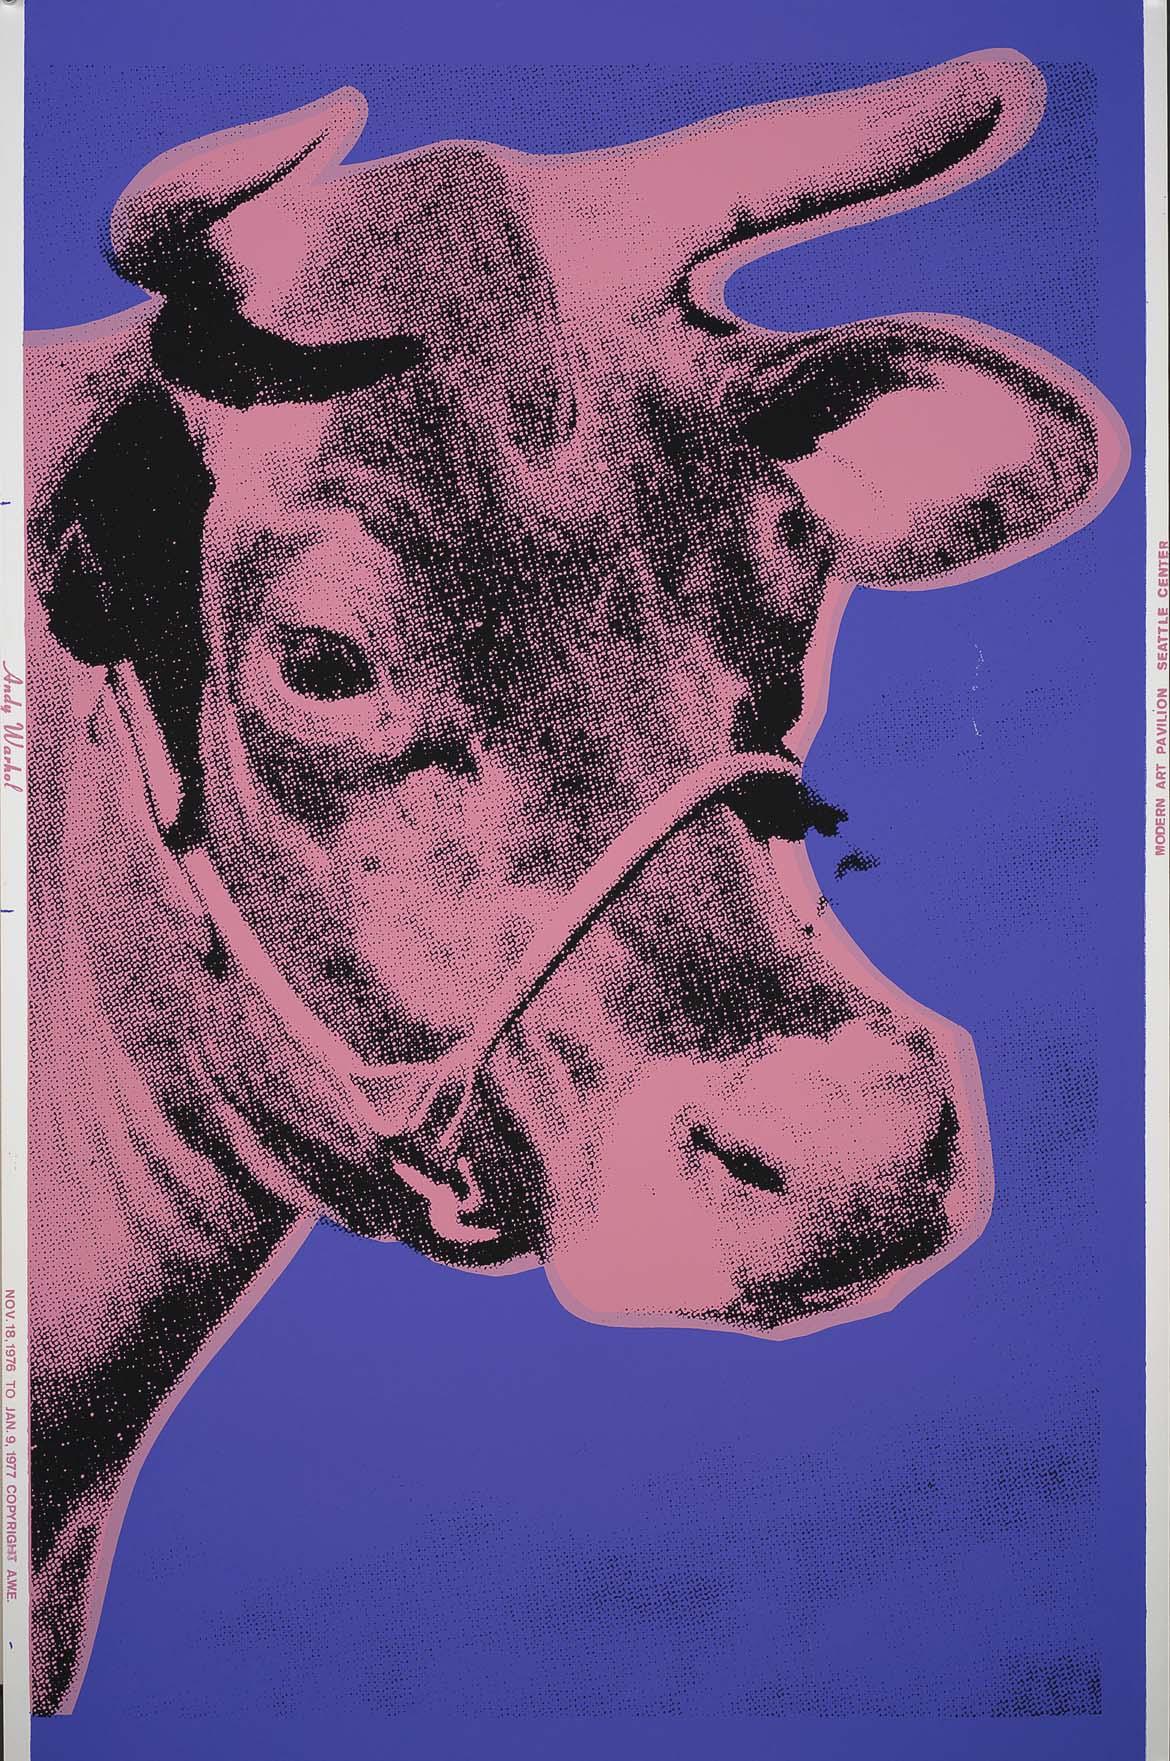 Cow (fs Ii.12a) by Andy Warhol